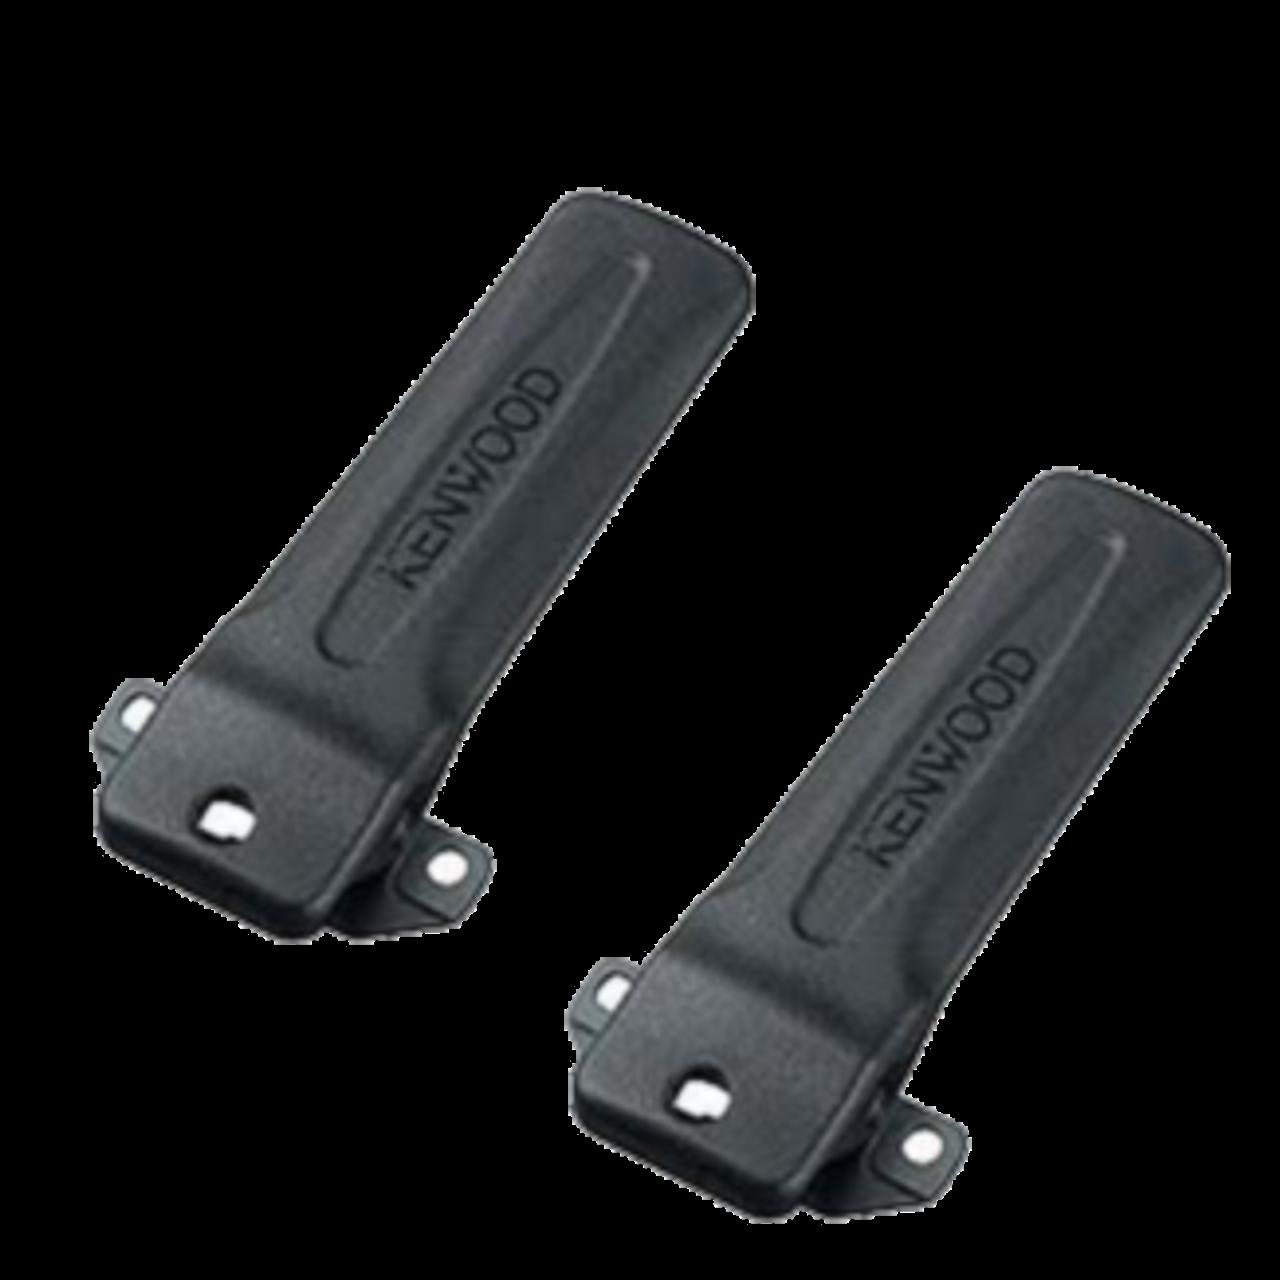 TWAYRDIO KBH-12 Replacement Two-Way Radio Belt Clip for Kenwood Walkie Talkie TK3140 TK2160 TK2360 TK2140 NX-220 TK-2360 NX-320 TK-3360 3 packs